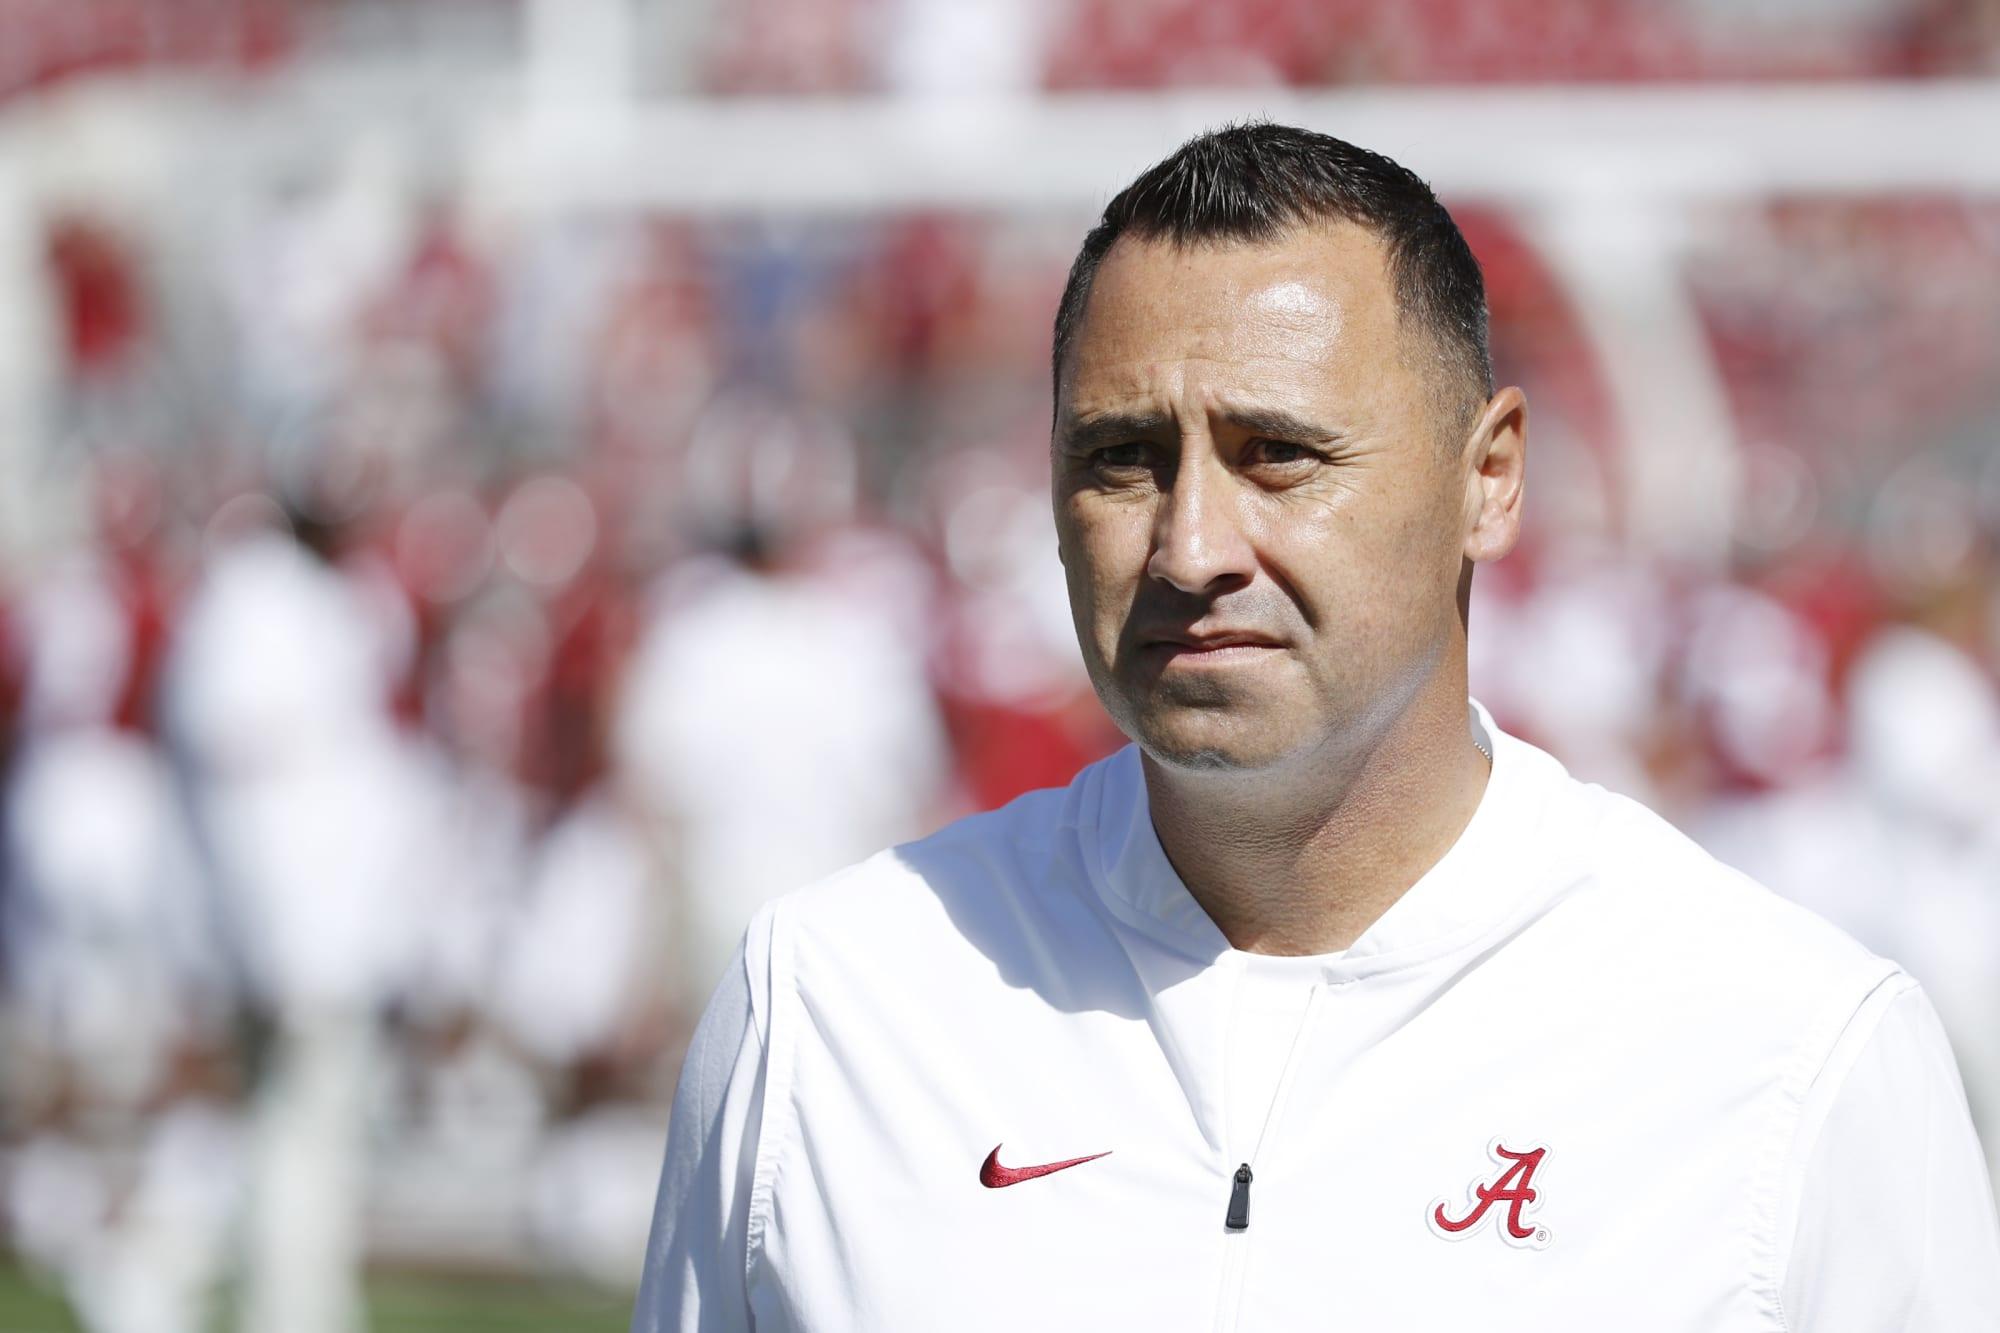 Alabama football makes Steve Sarkisian one of highest-paid assistants with massive raise